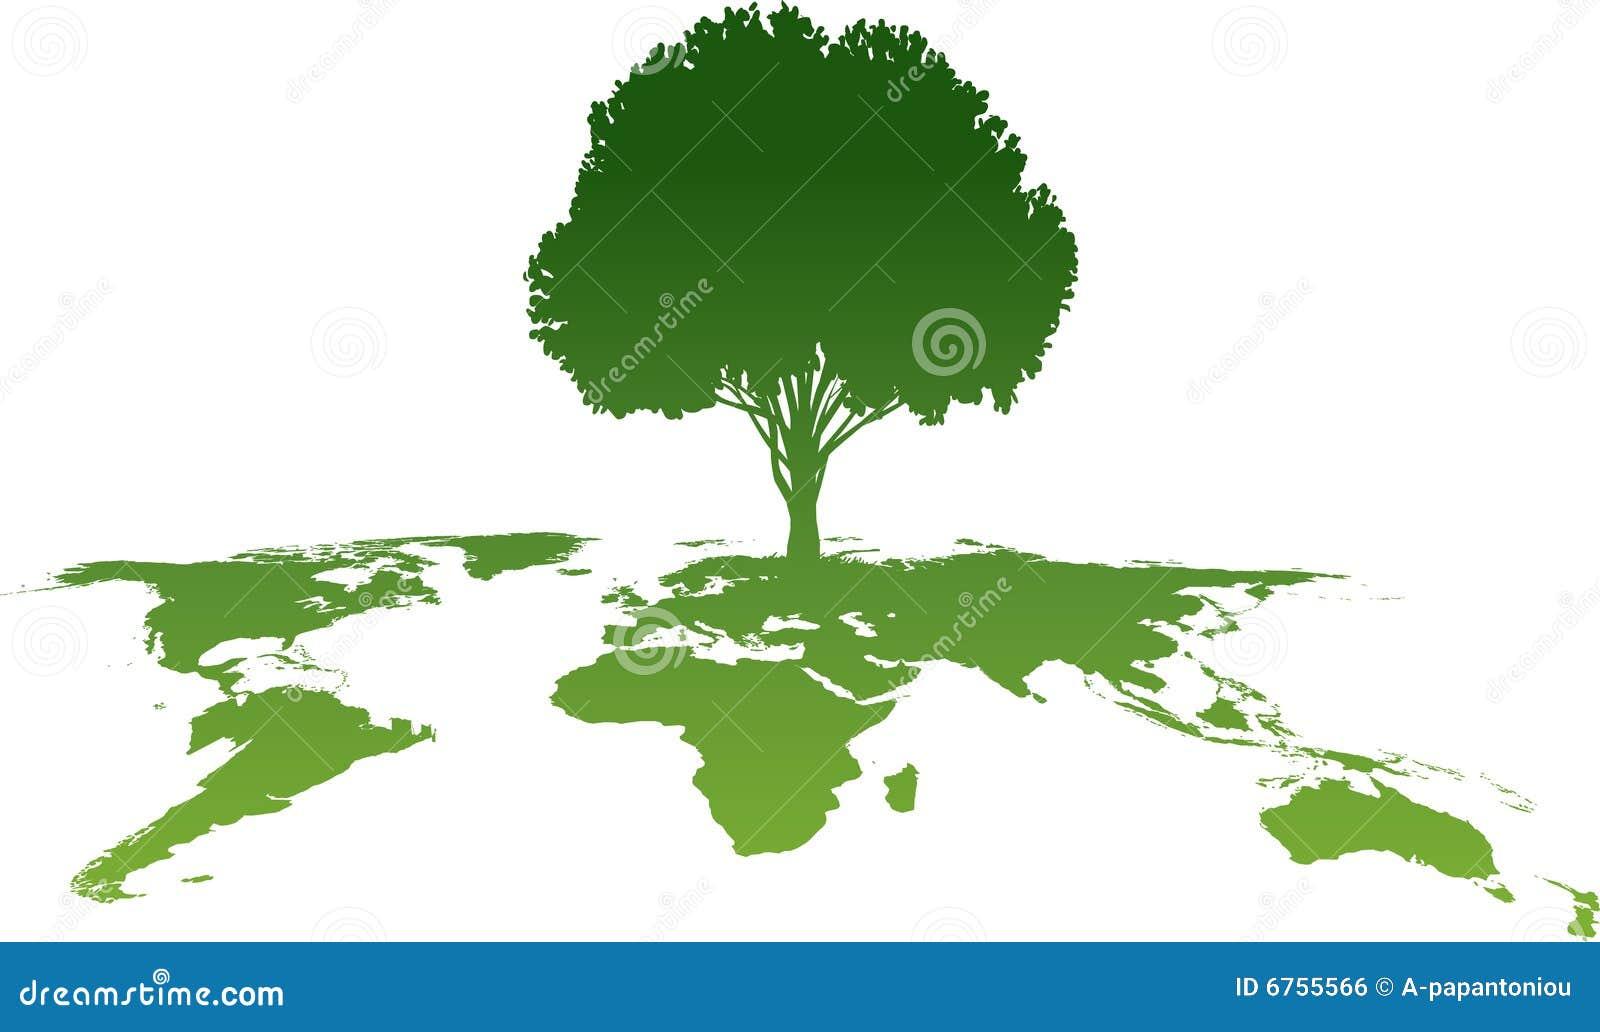 Grüner Baum Atlas